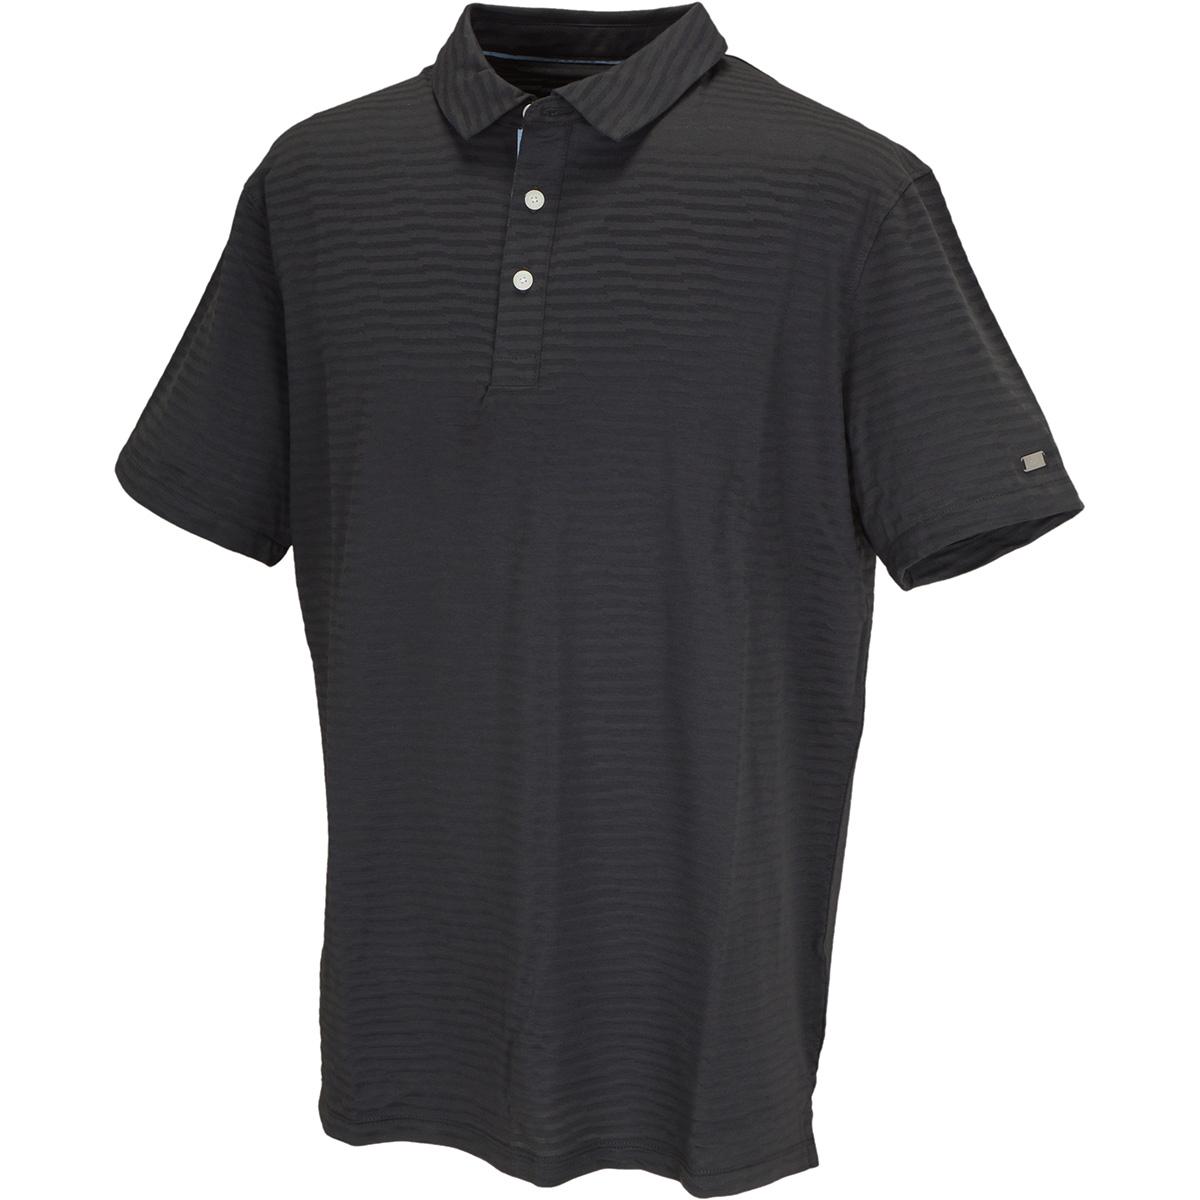 DRI-FIT プレイヤー ジャカード 半袖ポロシャツ